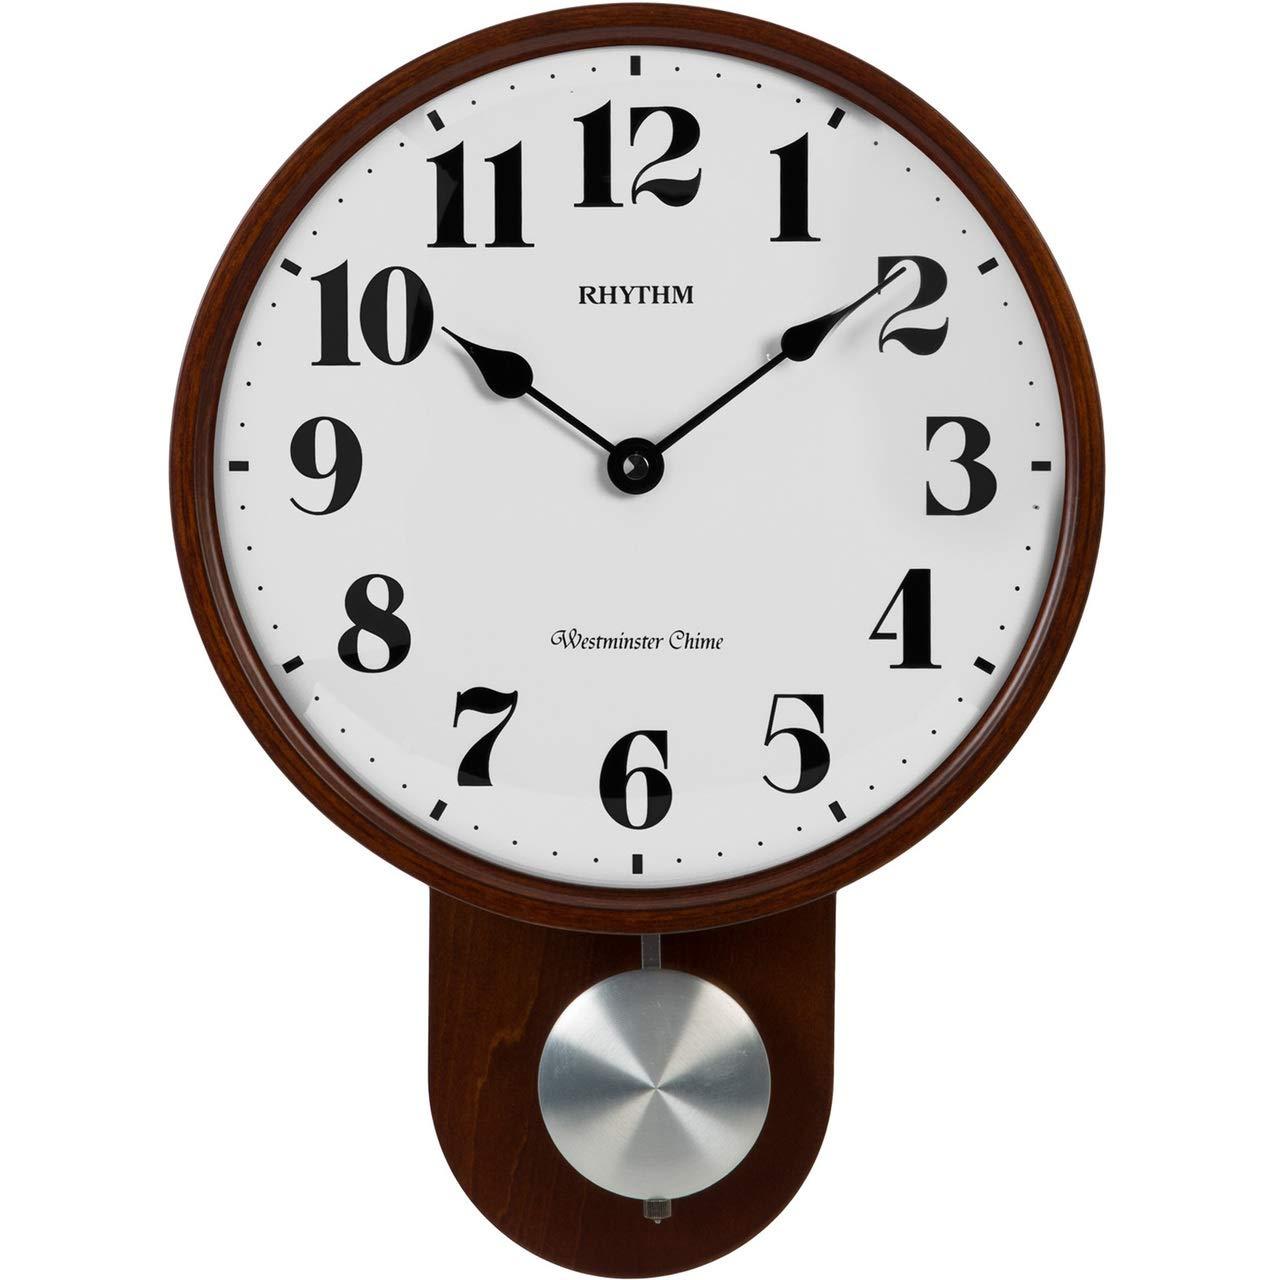 Buy Rhythm (Japan) Brown Wood Round Swinging Pendulum